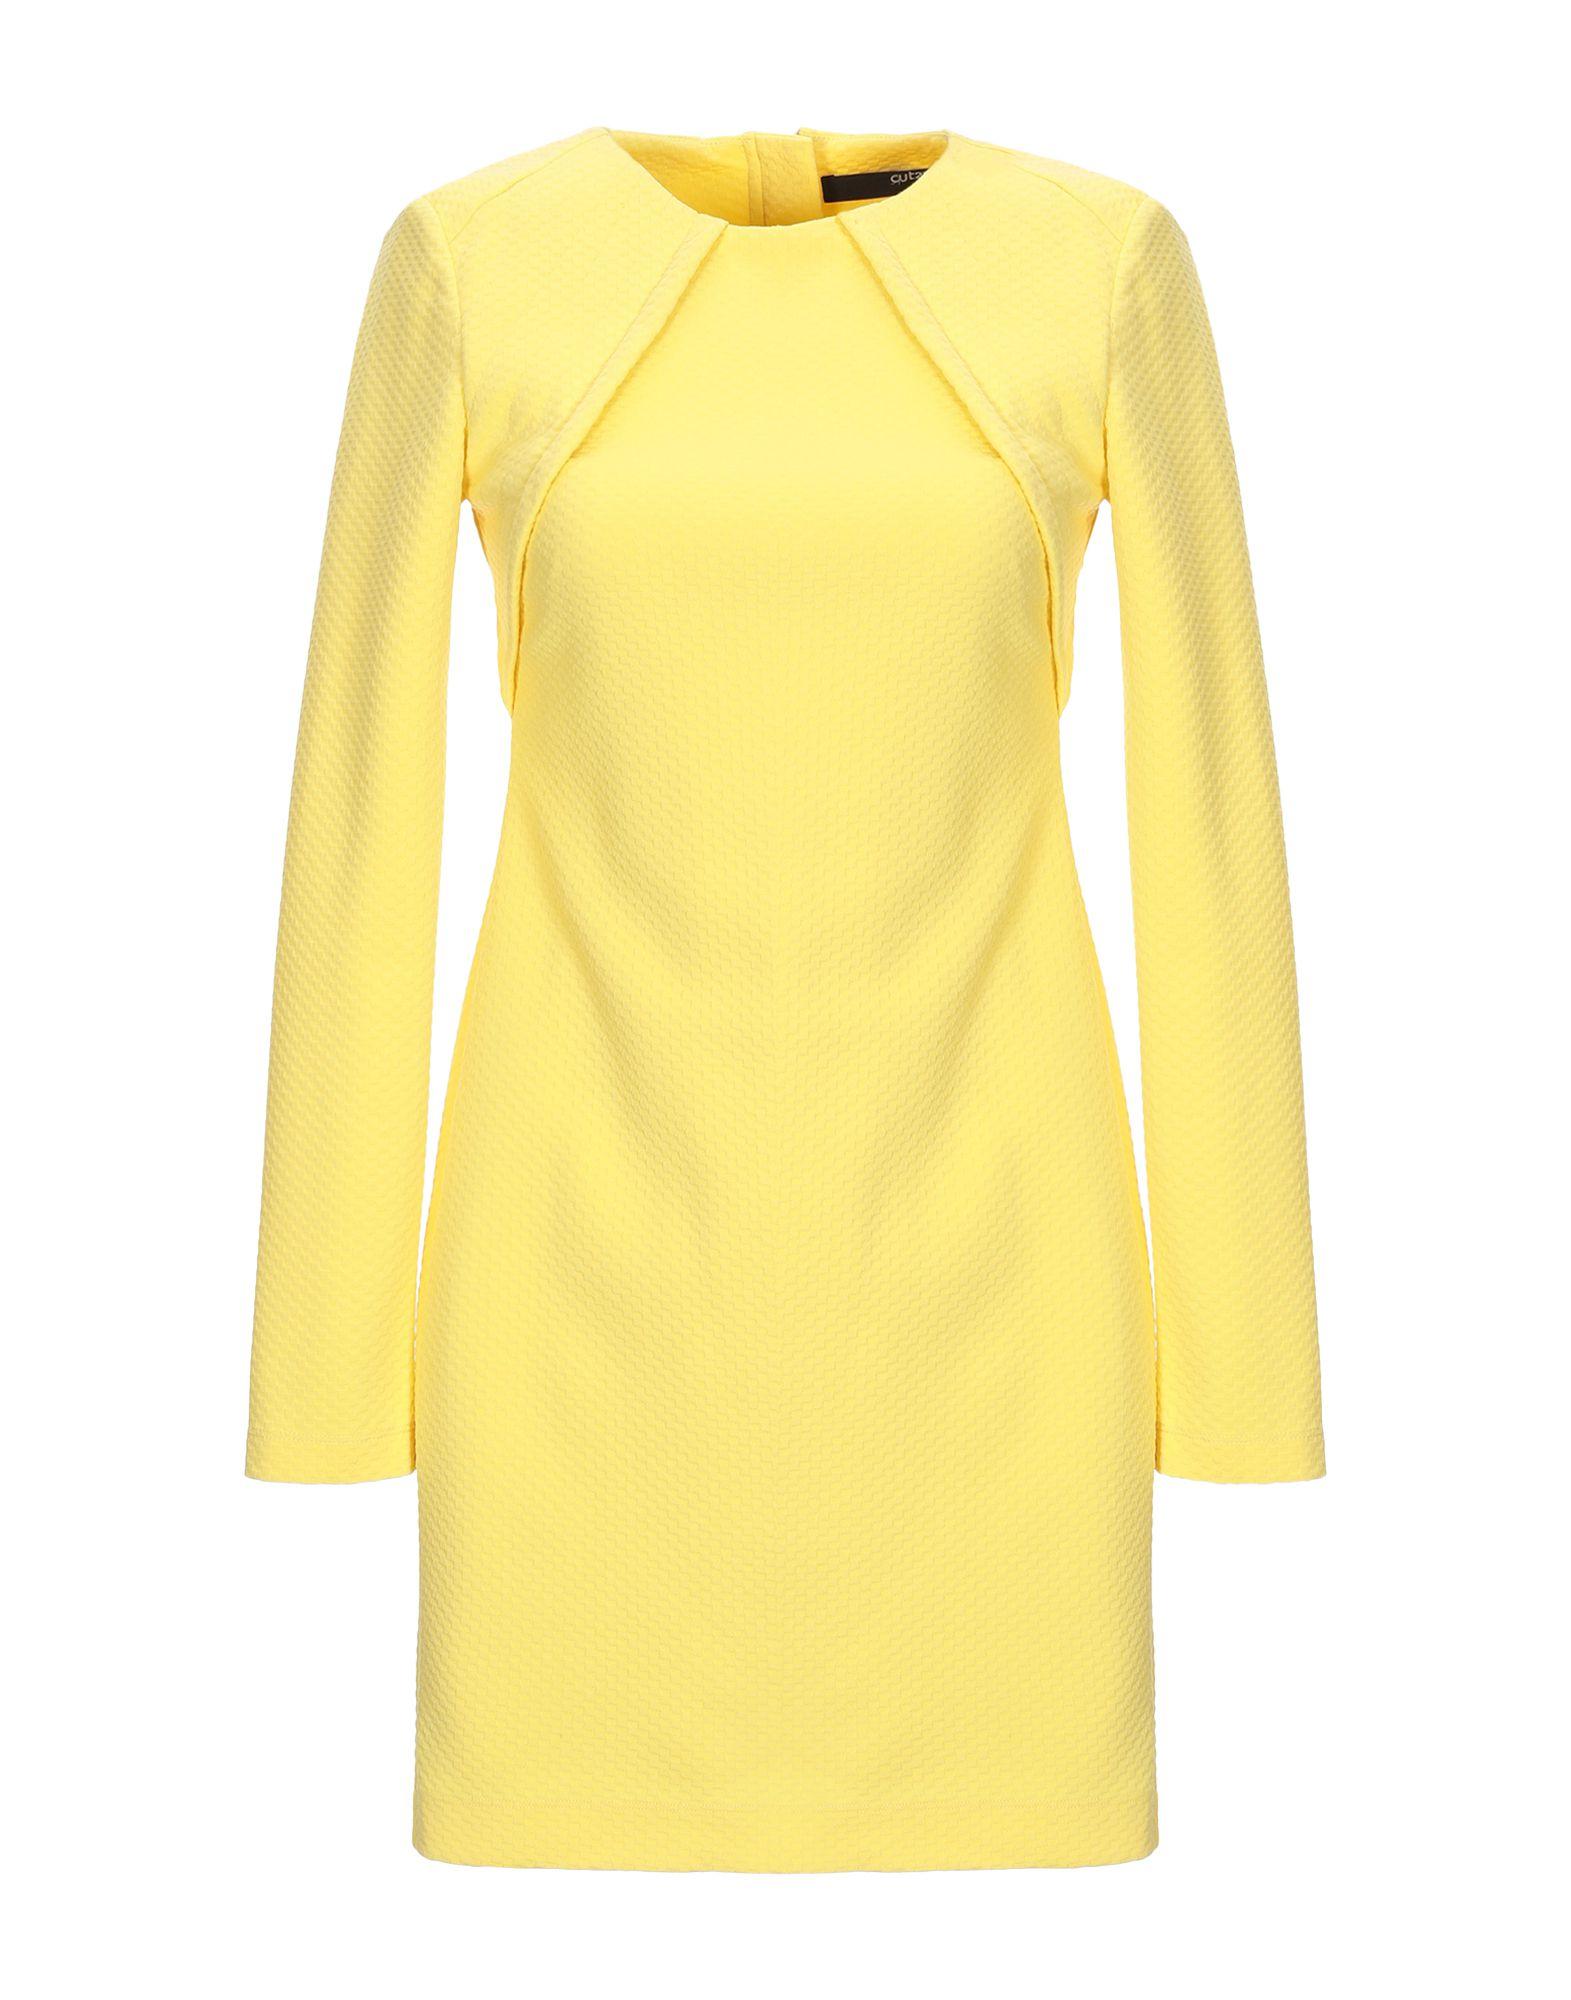 CUT25 by YIGAL AZROUËL Короткое платье недорго, оригинальная цена